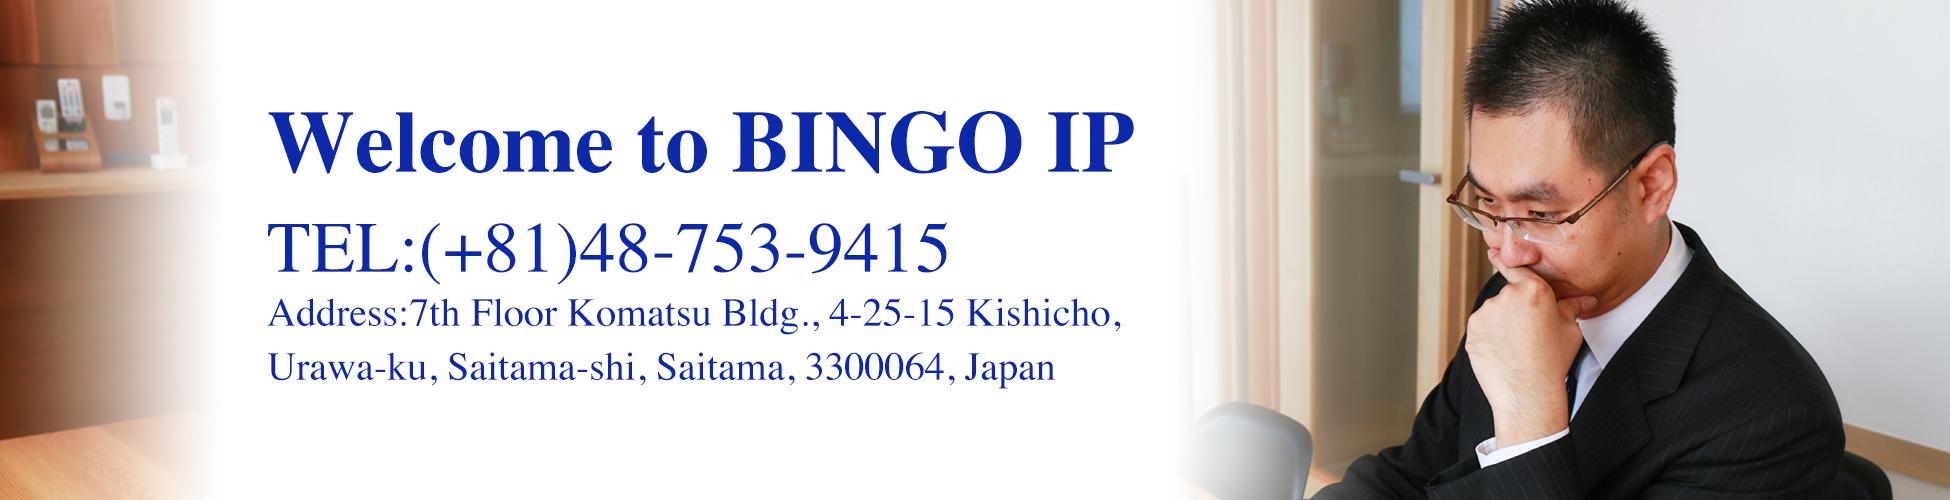 Welcome to BINGO IP